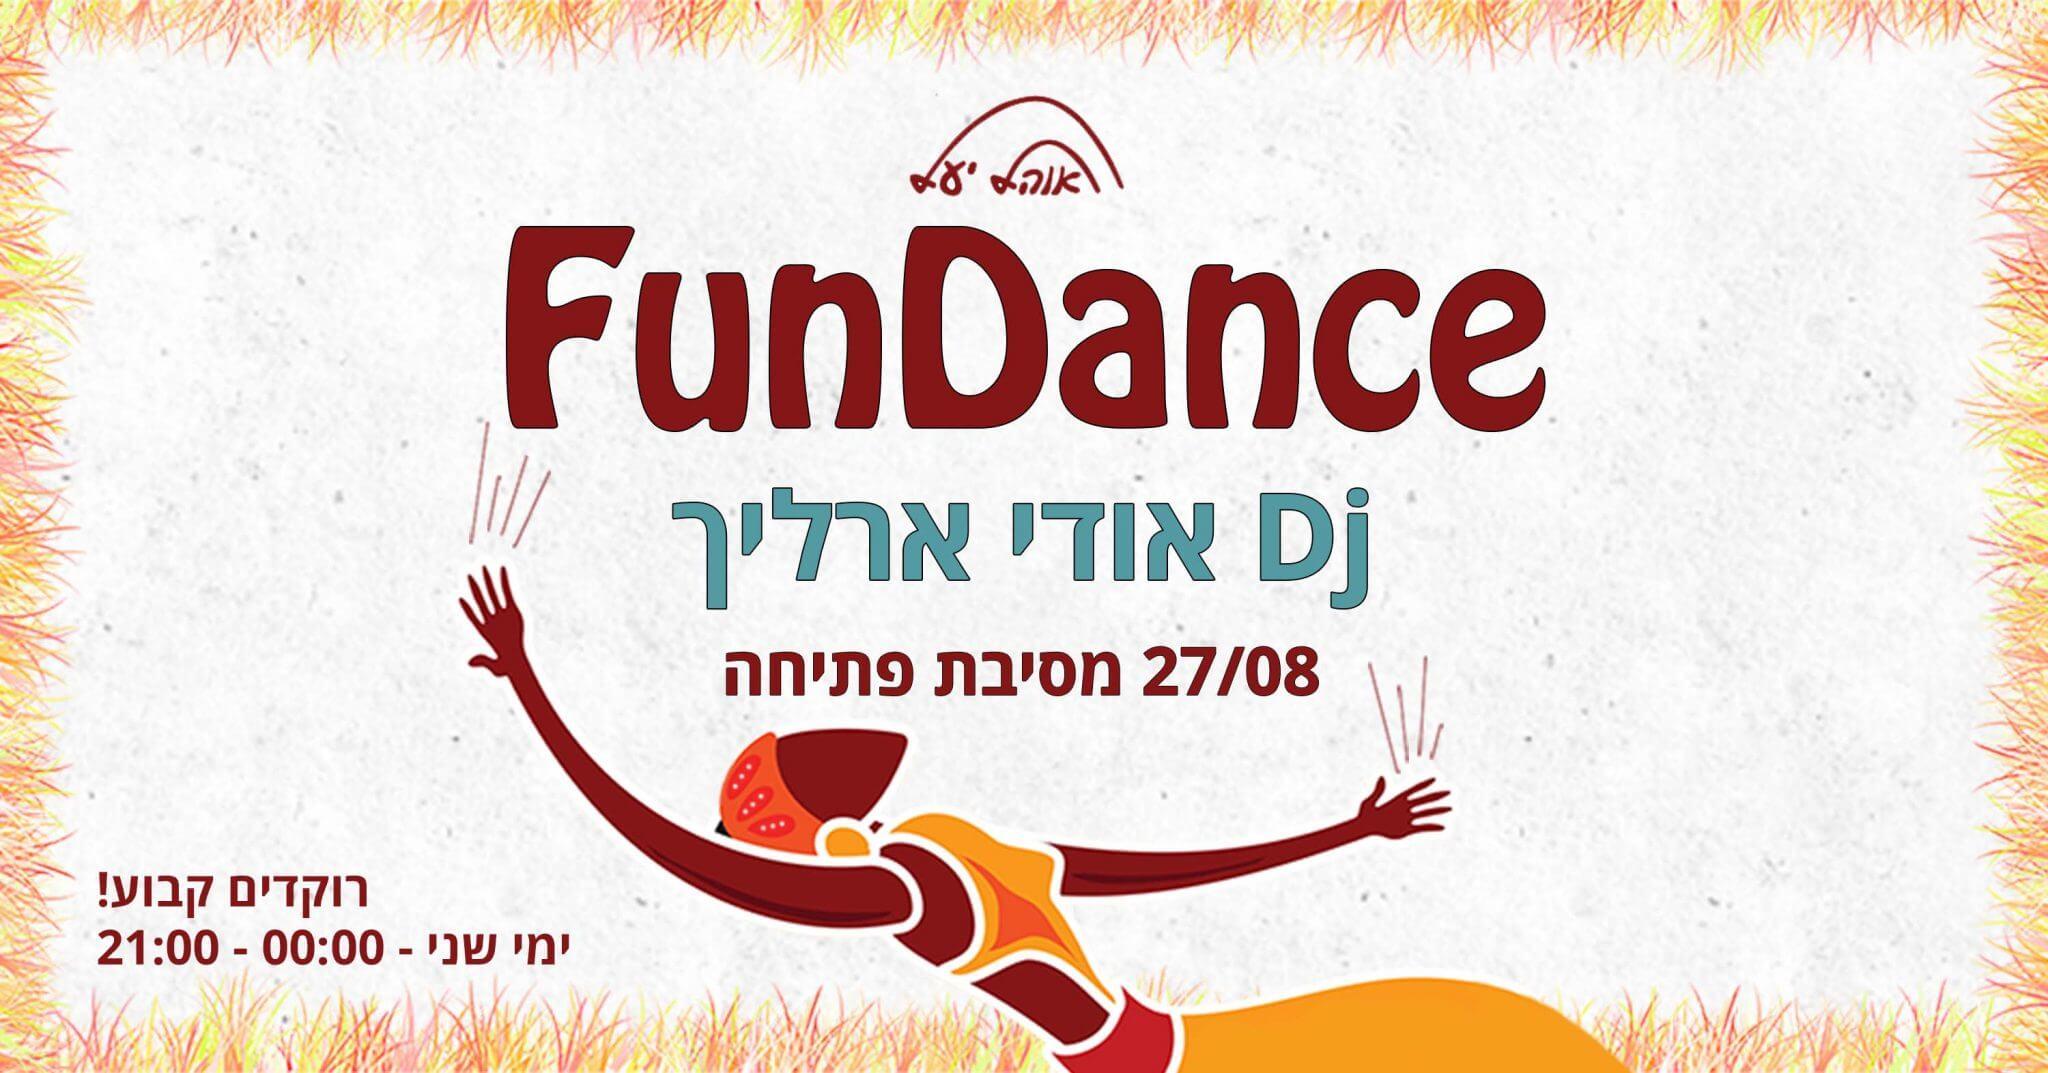 FunDance